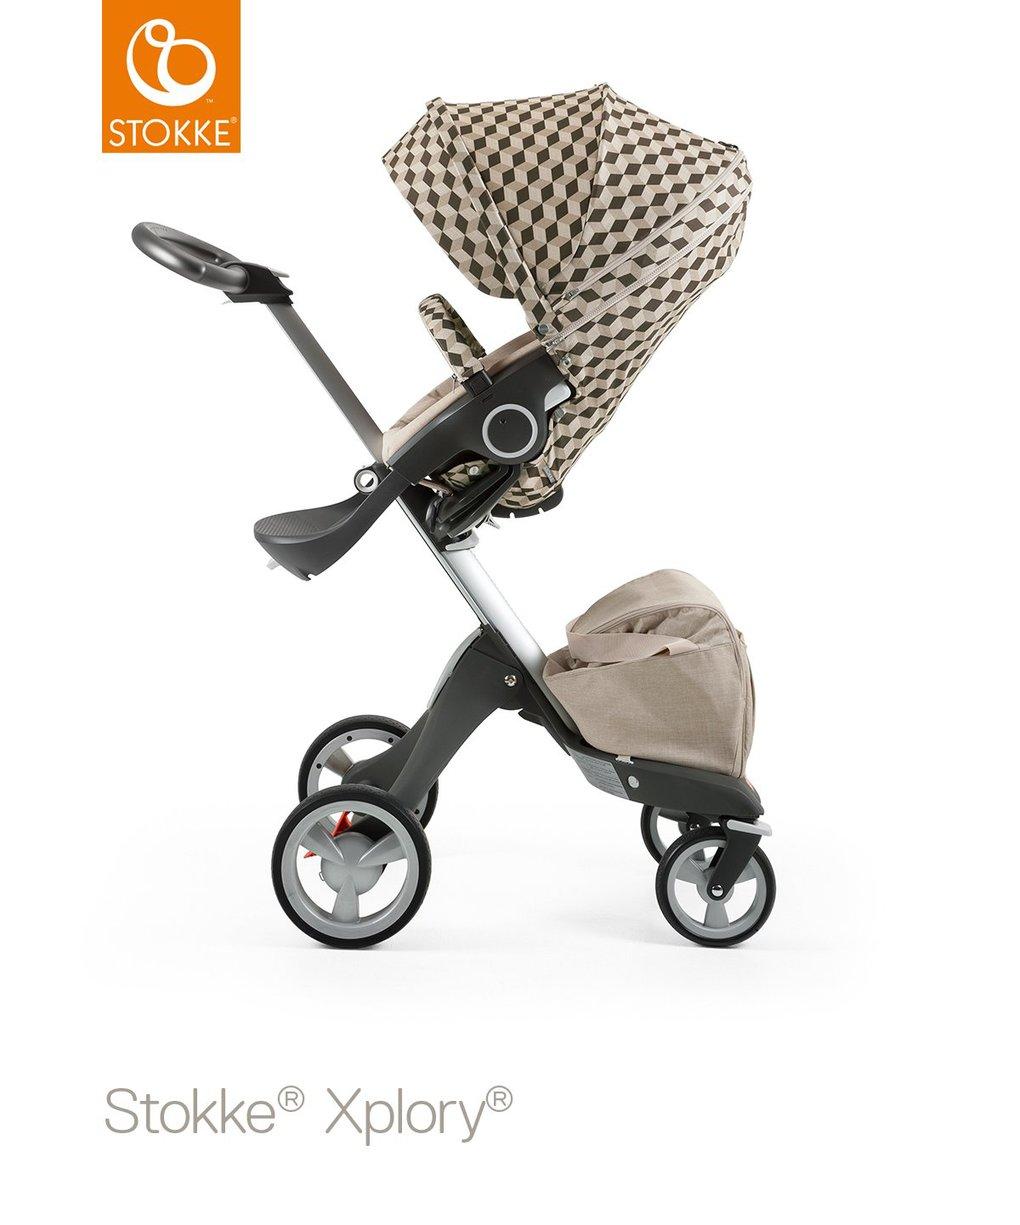 Style kit per seggiolino da passeggino stokke - beige cube - Stokke